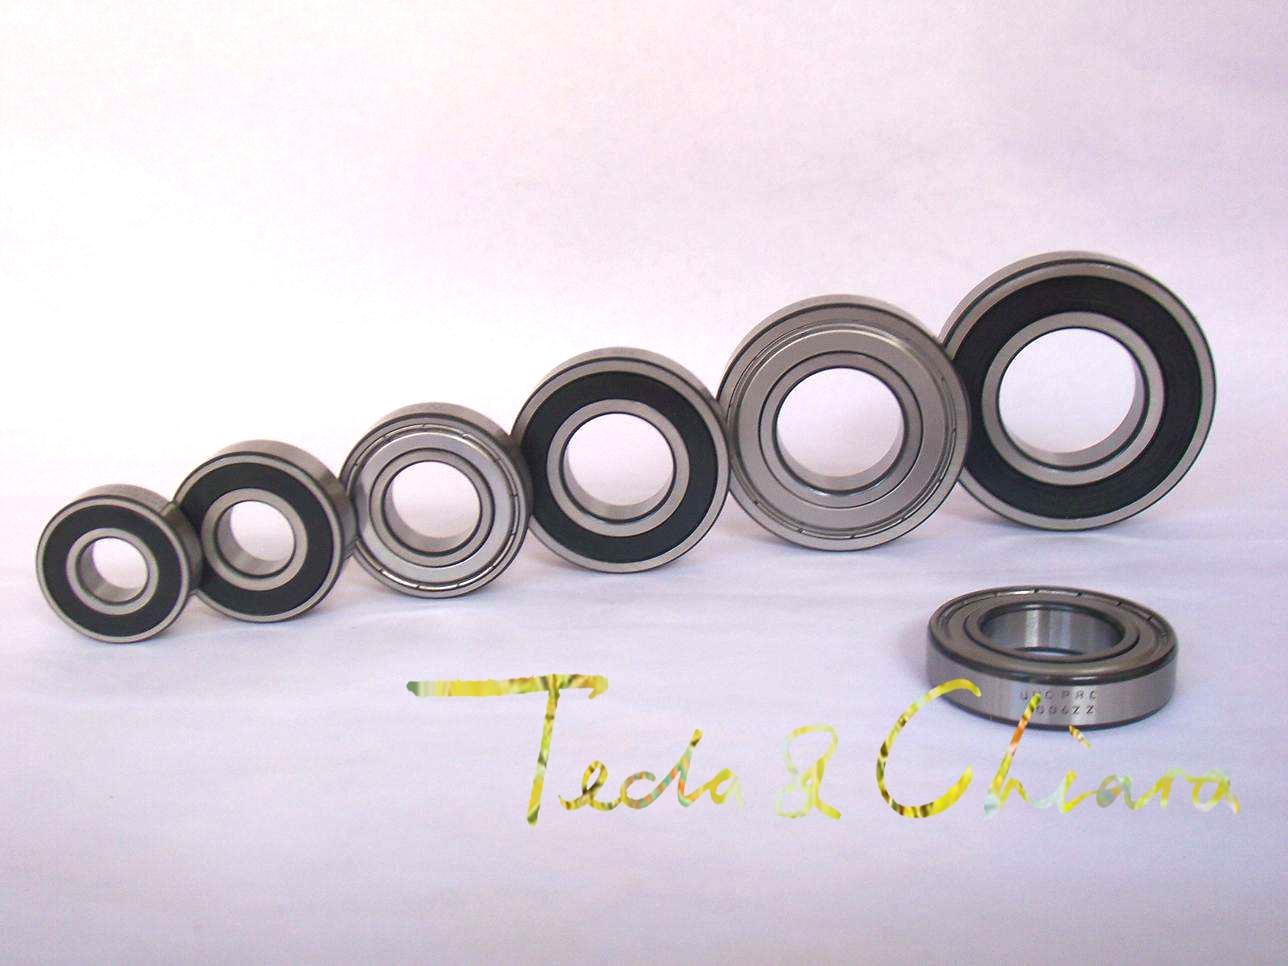 10Pcs 1Lot R8 R8ZZ R8RS R8-2Z R8Z R8-2RS ZZ RS RZ 2RZ Deep Groove Ball Bearings 12.7 X 28.575 X 7.938mm 1/2